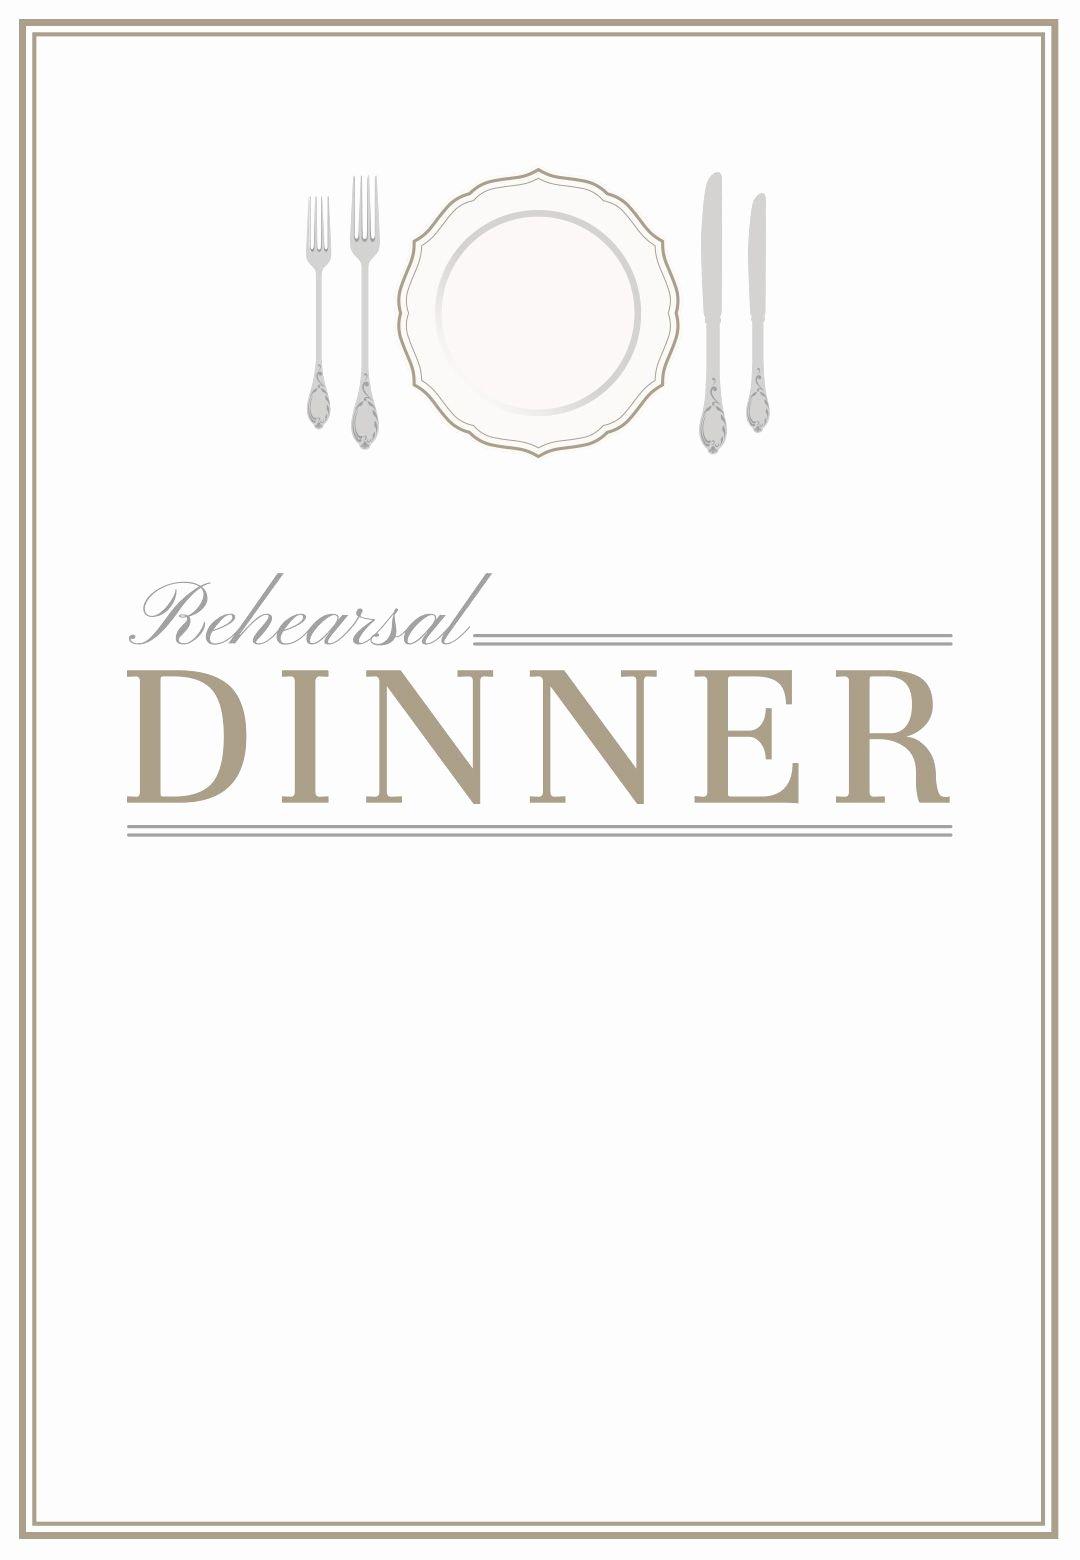 Free Printable Dinner Invitations Best Of Elegant Setting Free Printable Rehearsal Dinner Party